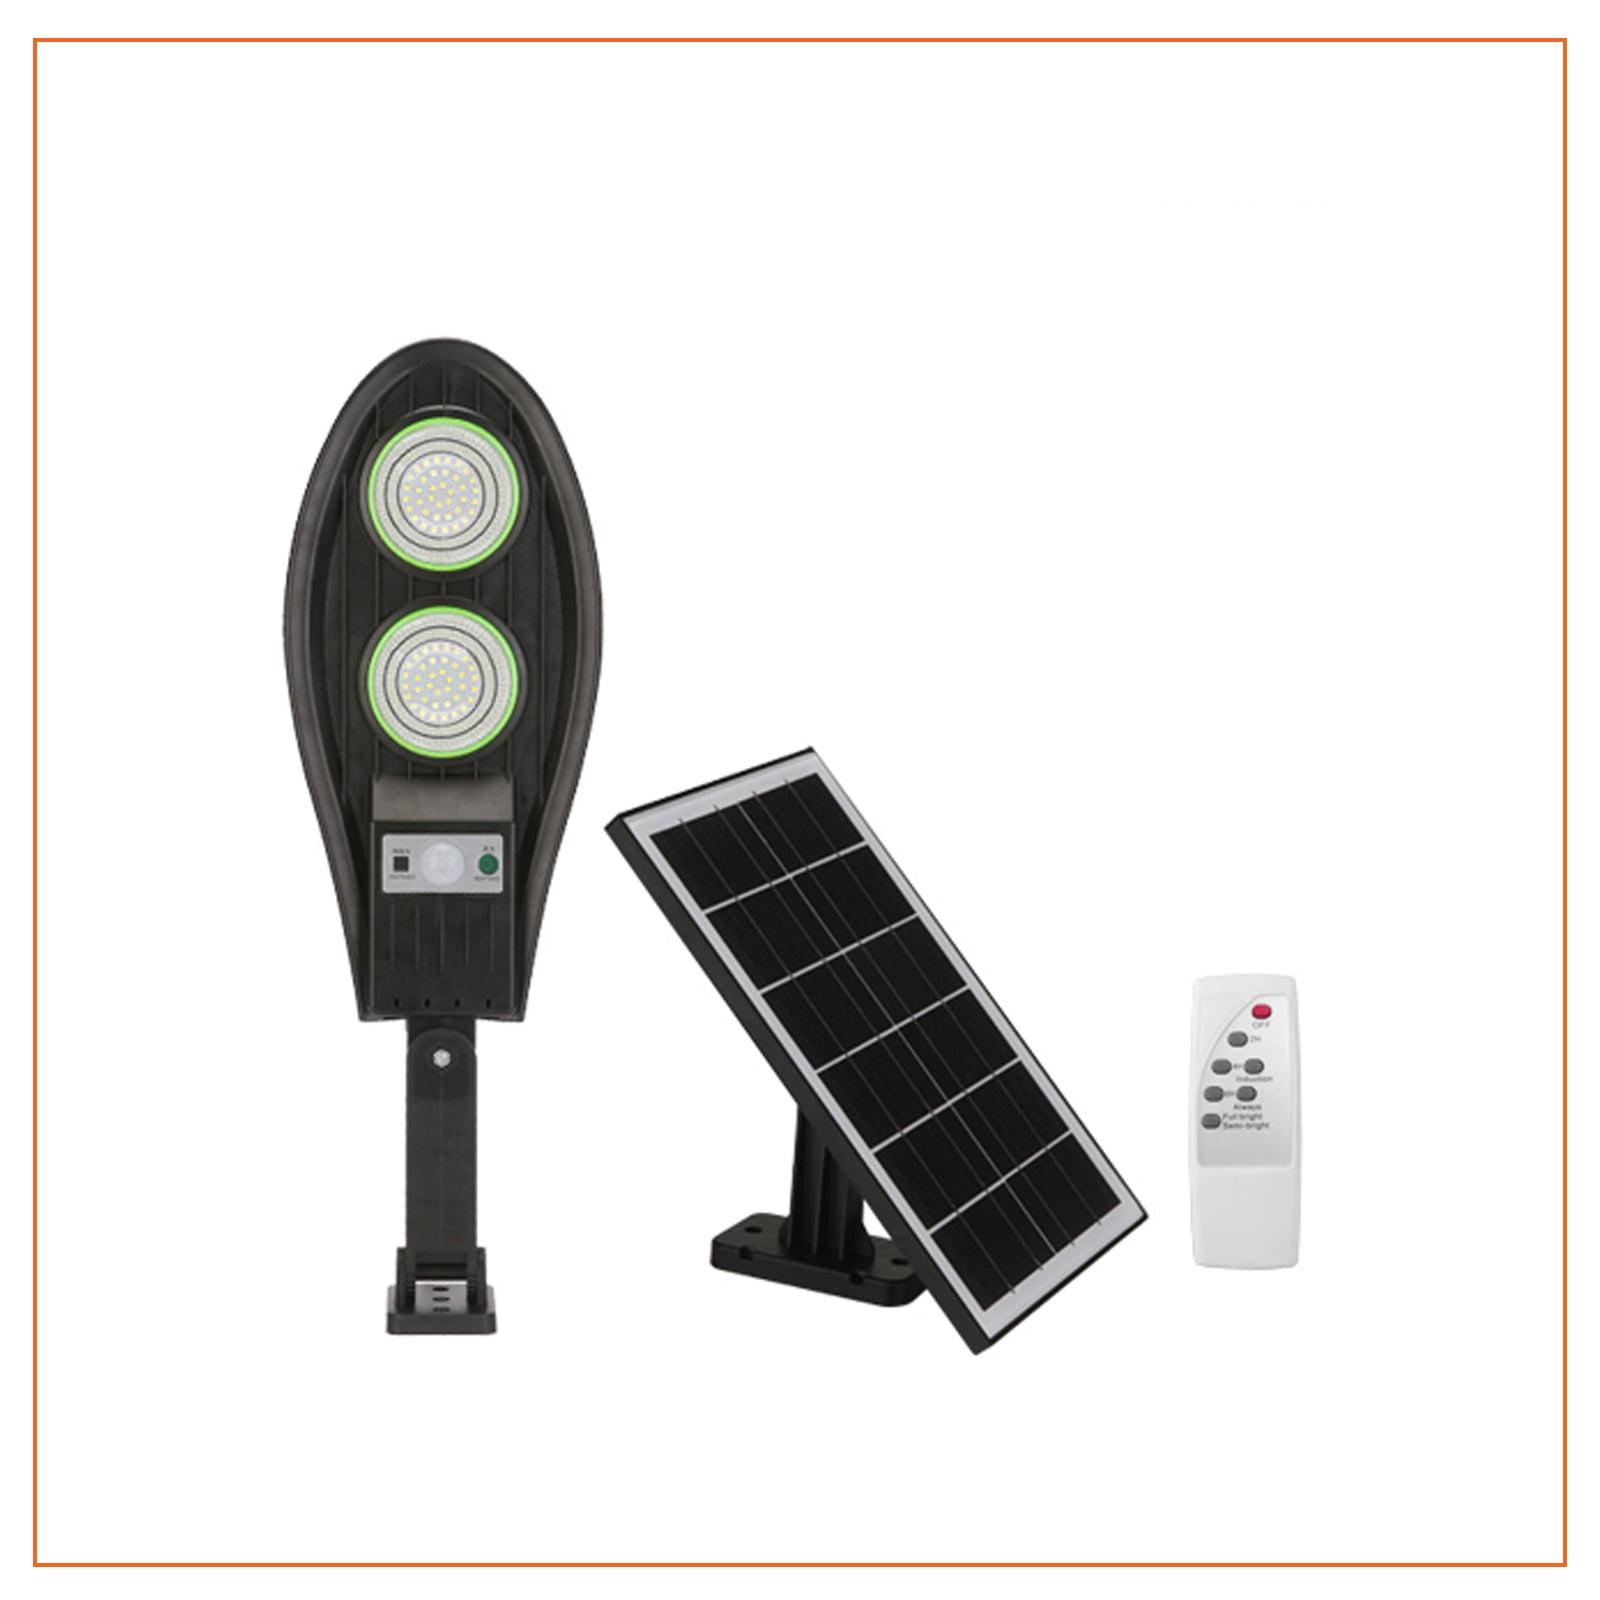 30 Watt Solar Street Light -GDSUPER GD730